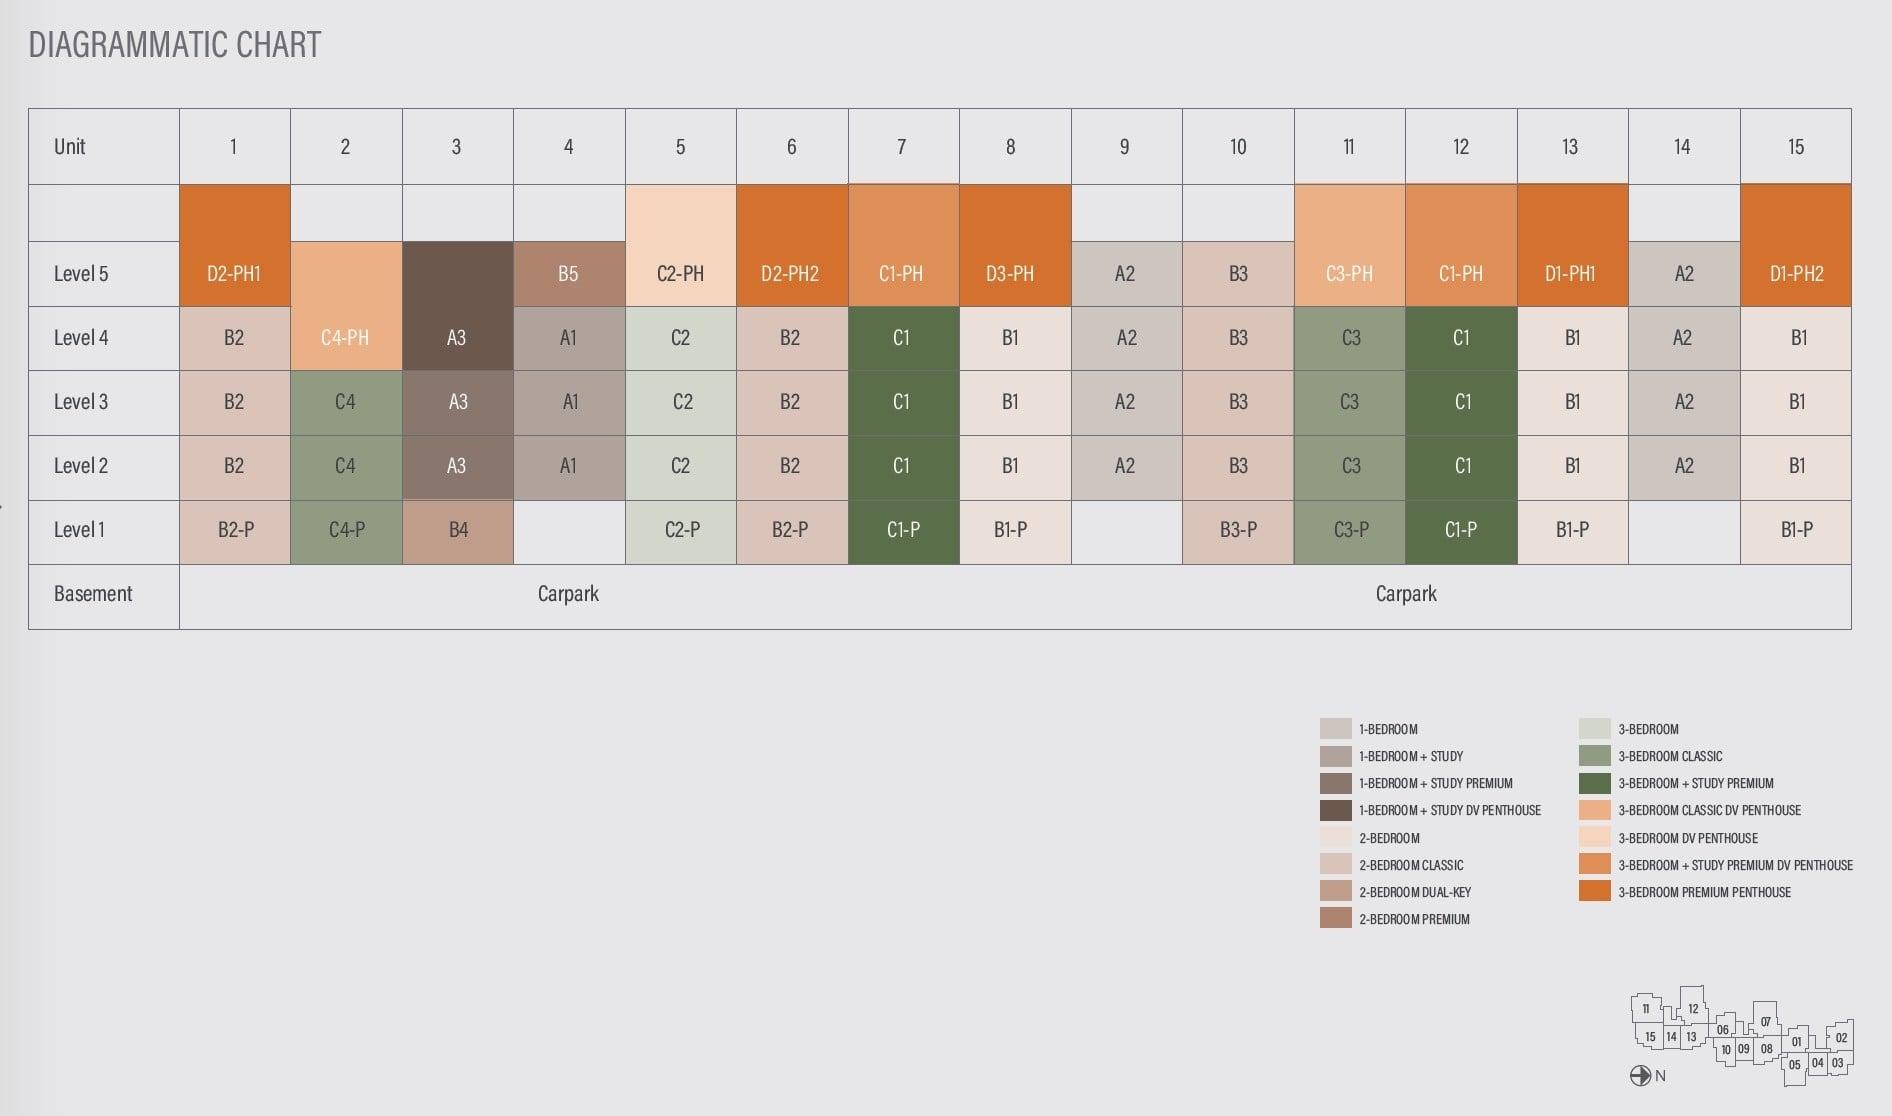 35-Gilstead Diagramtic Chart